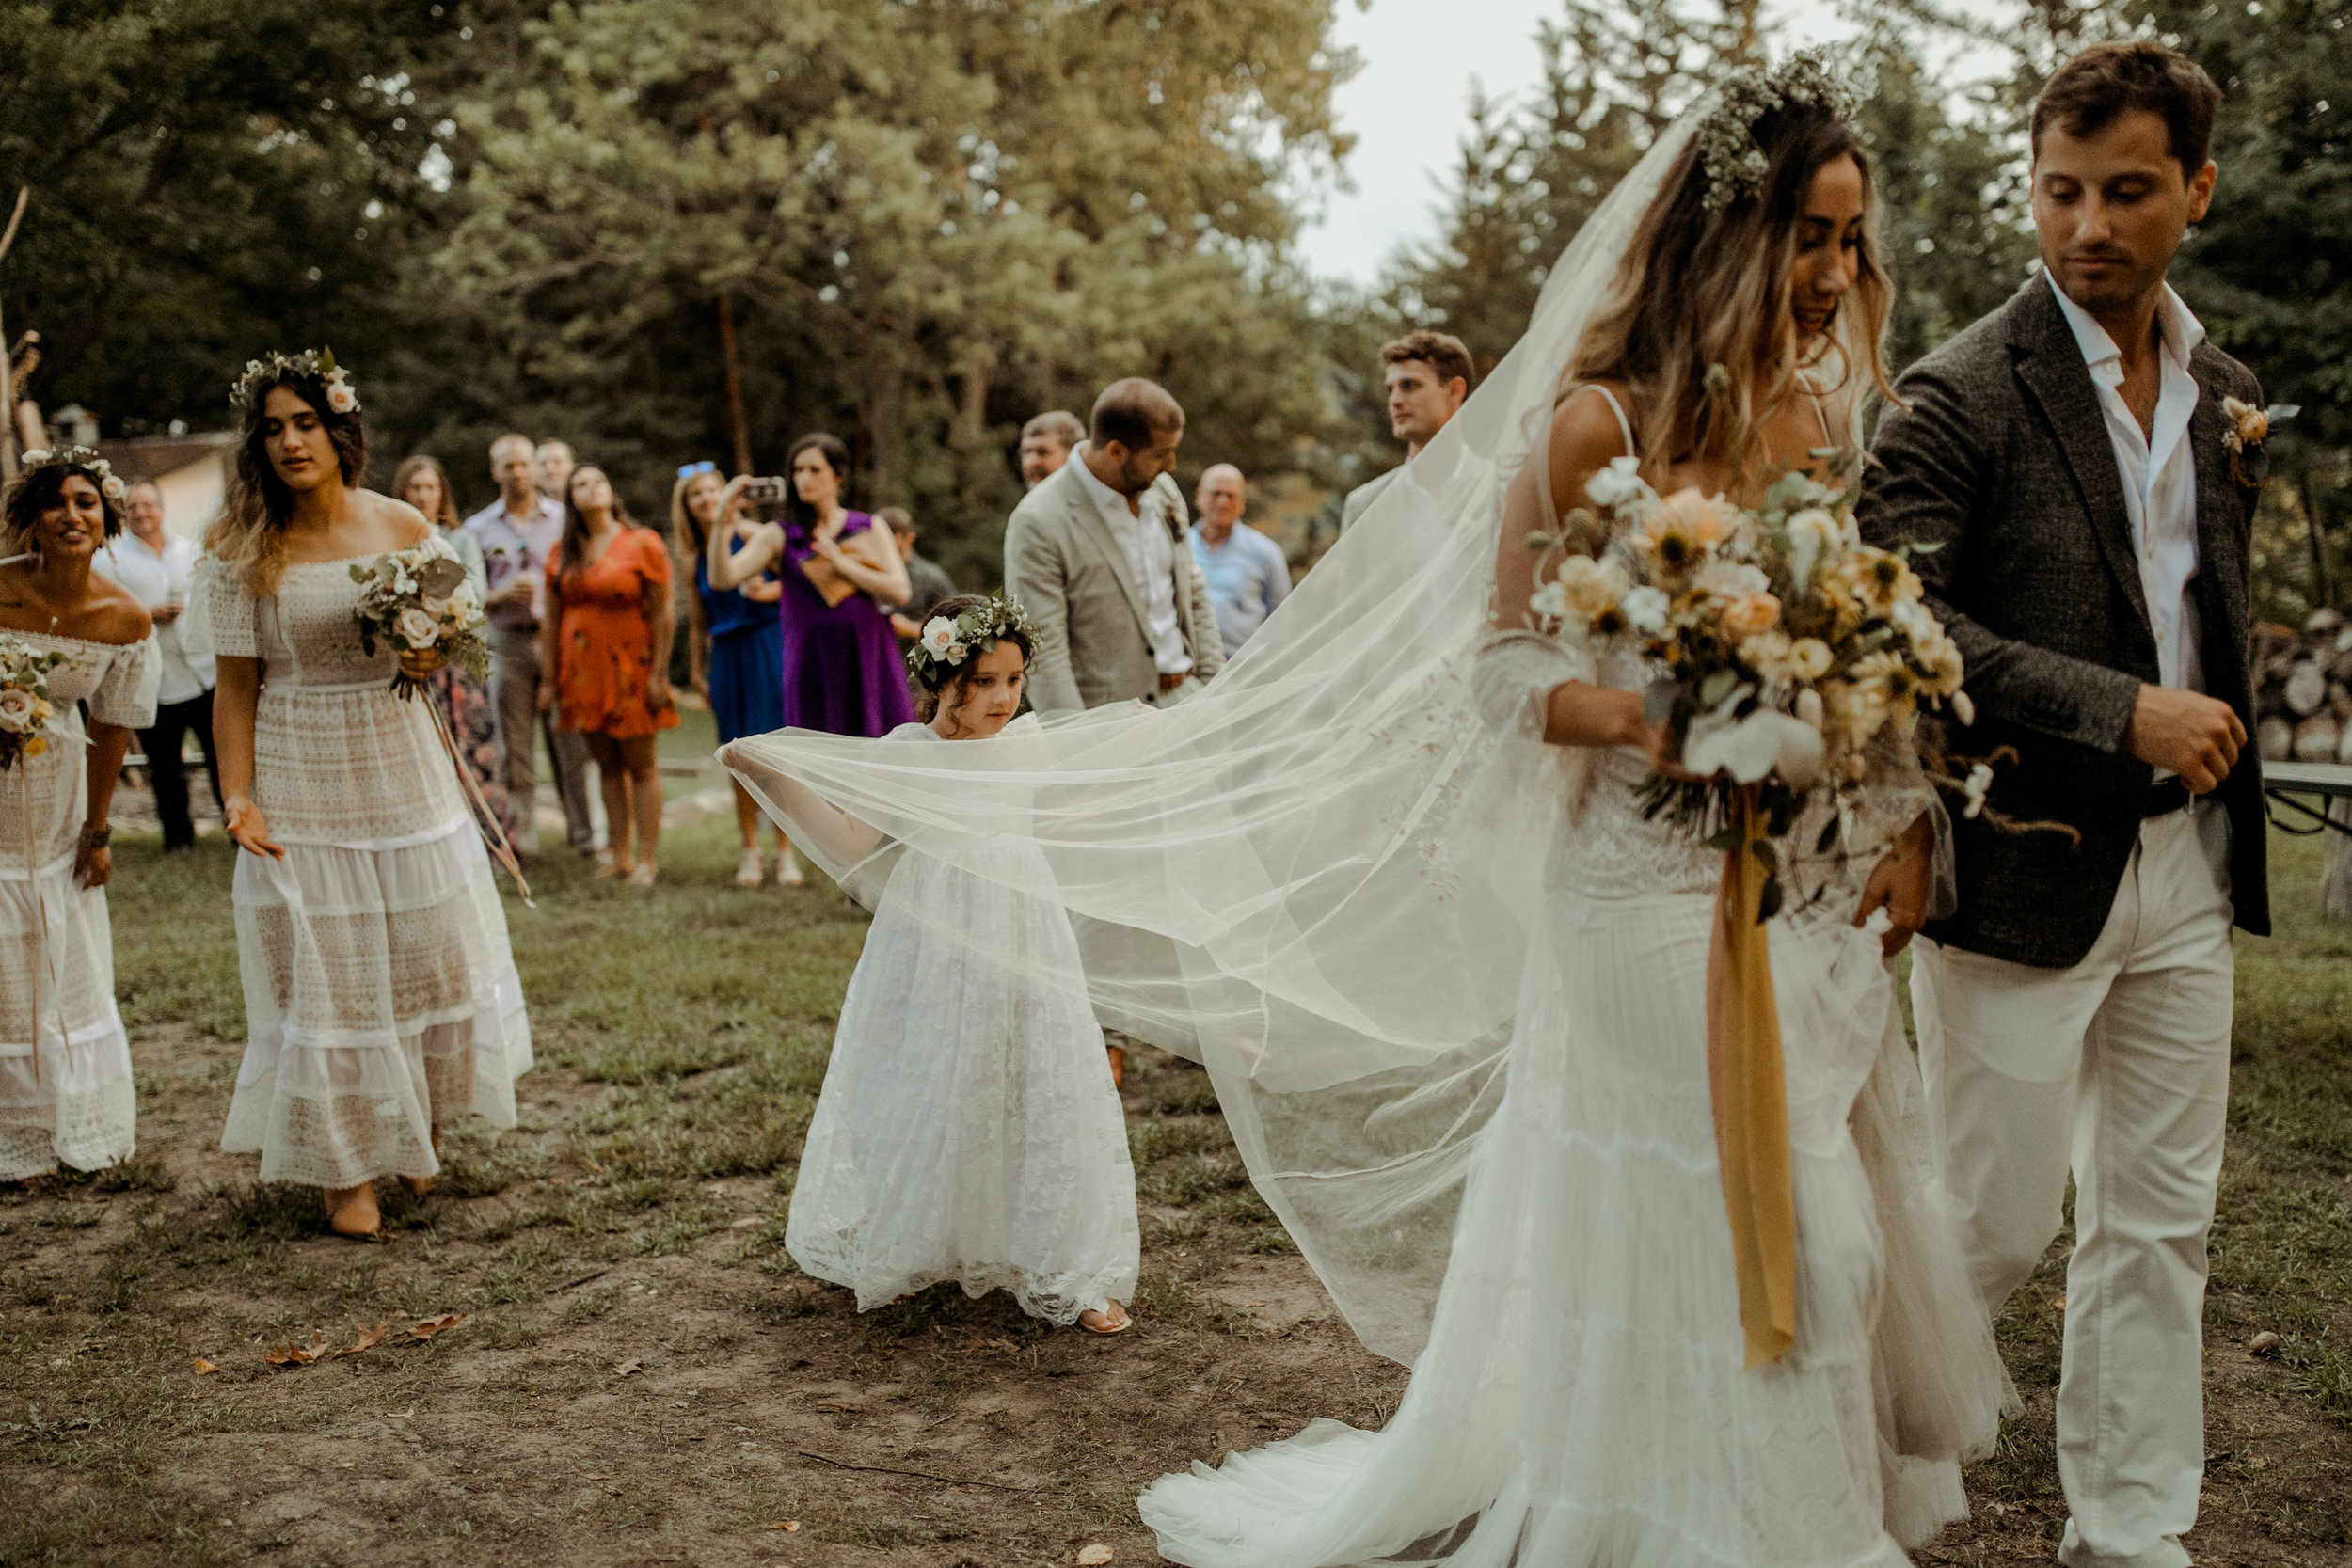 milwaukee-wedding-photographer-camp-wandawega-wedding-527.jpg